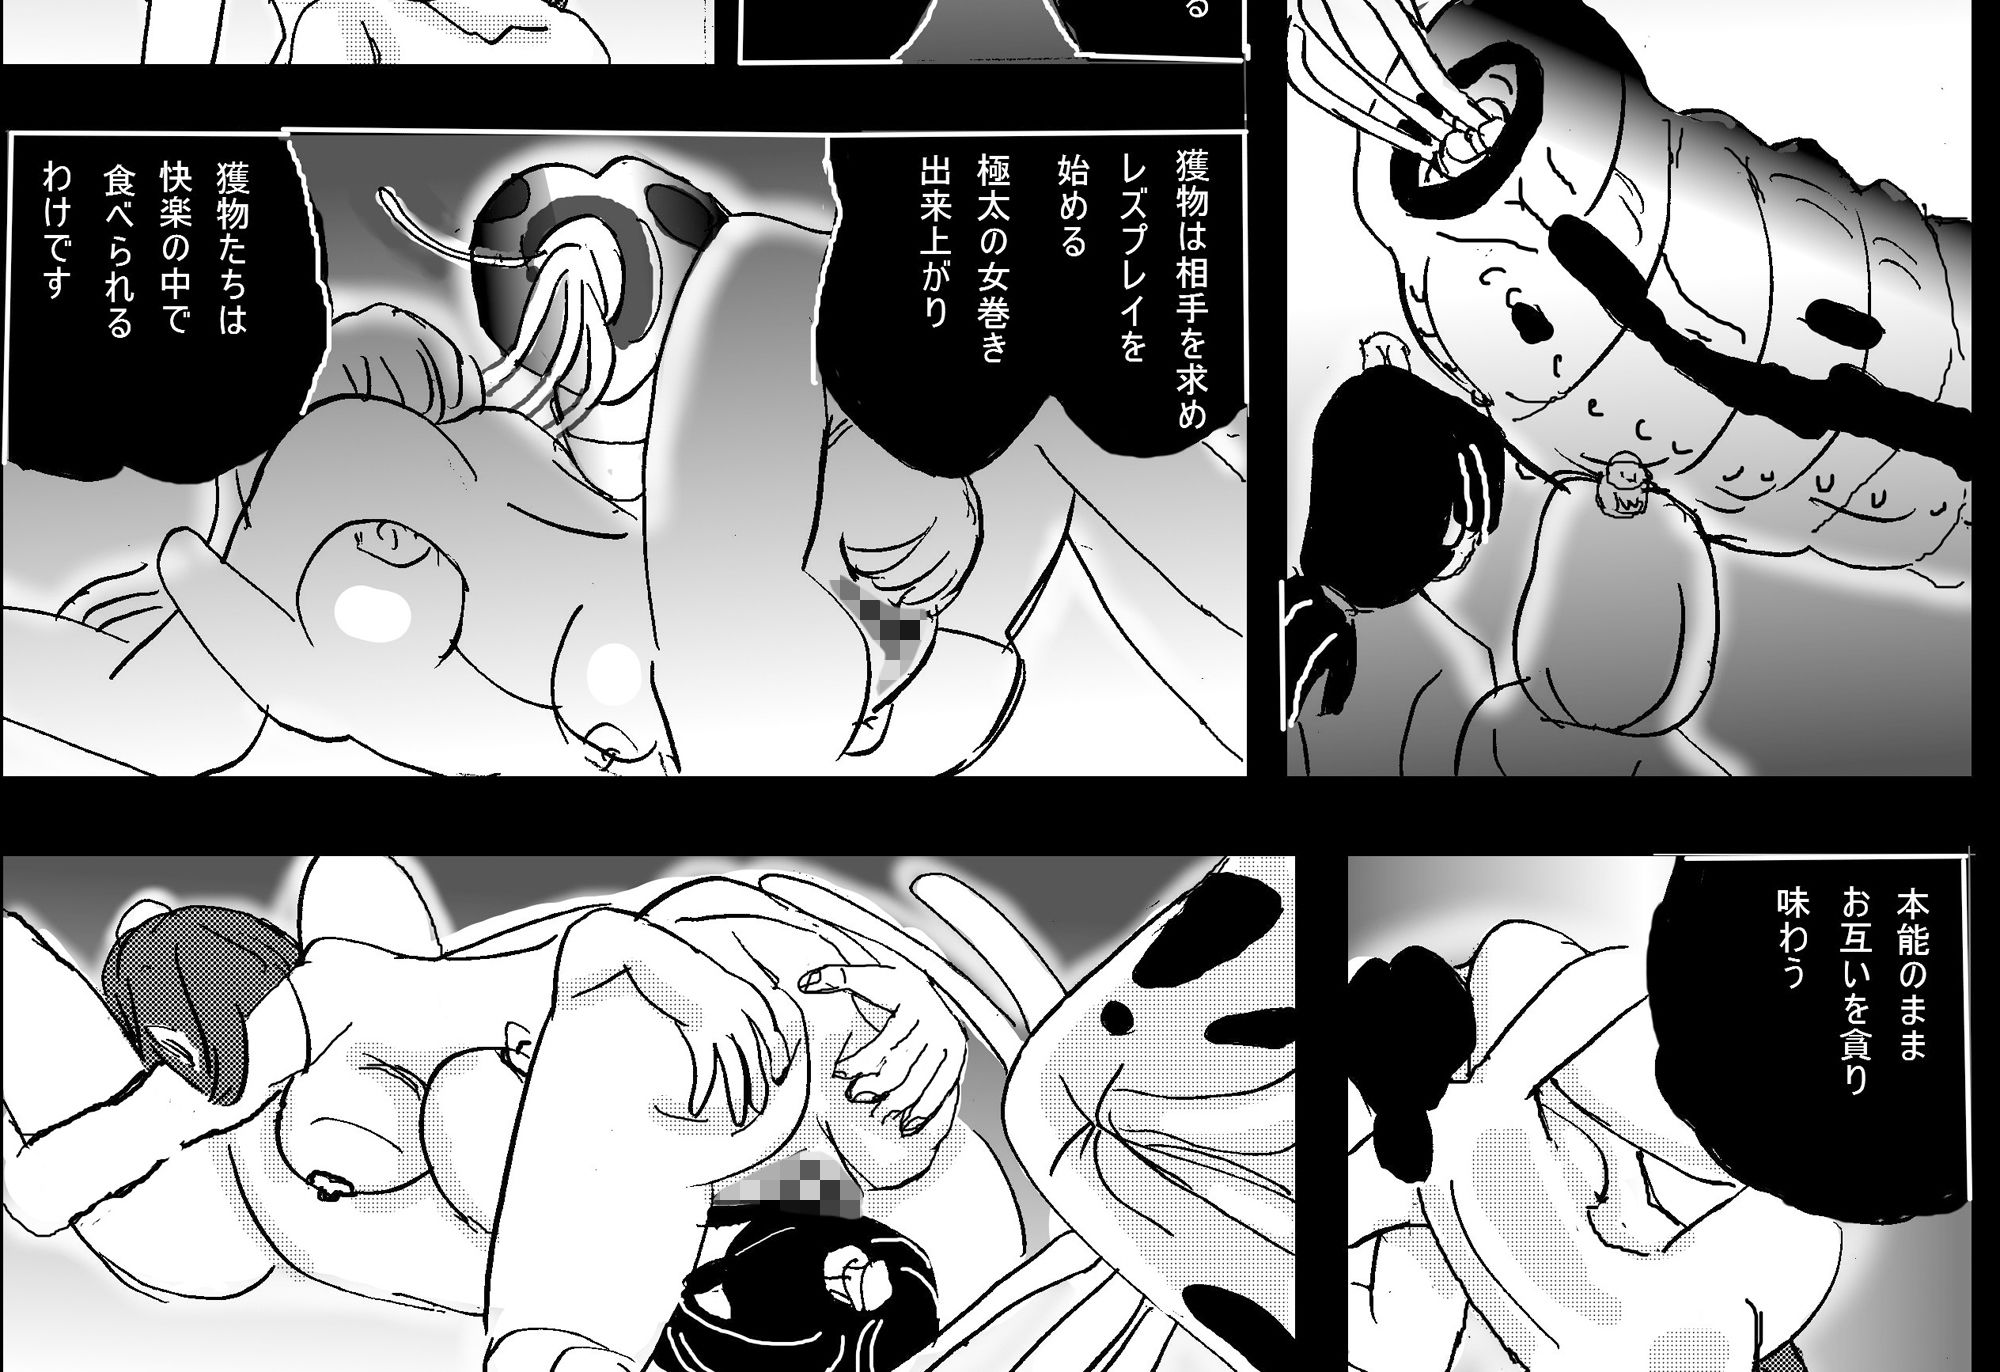 RPGの裏側〜モンスター○ァーム〜前編